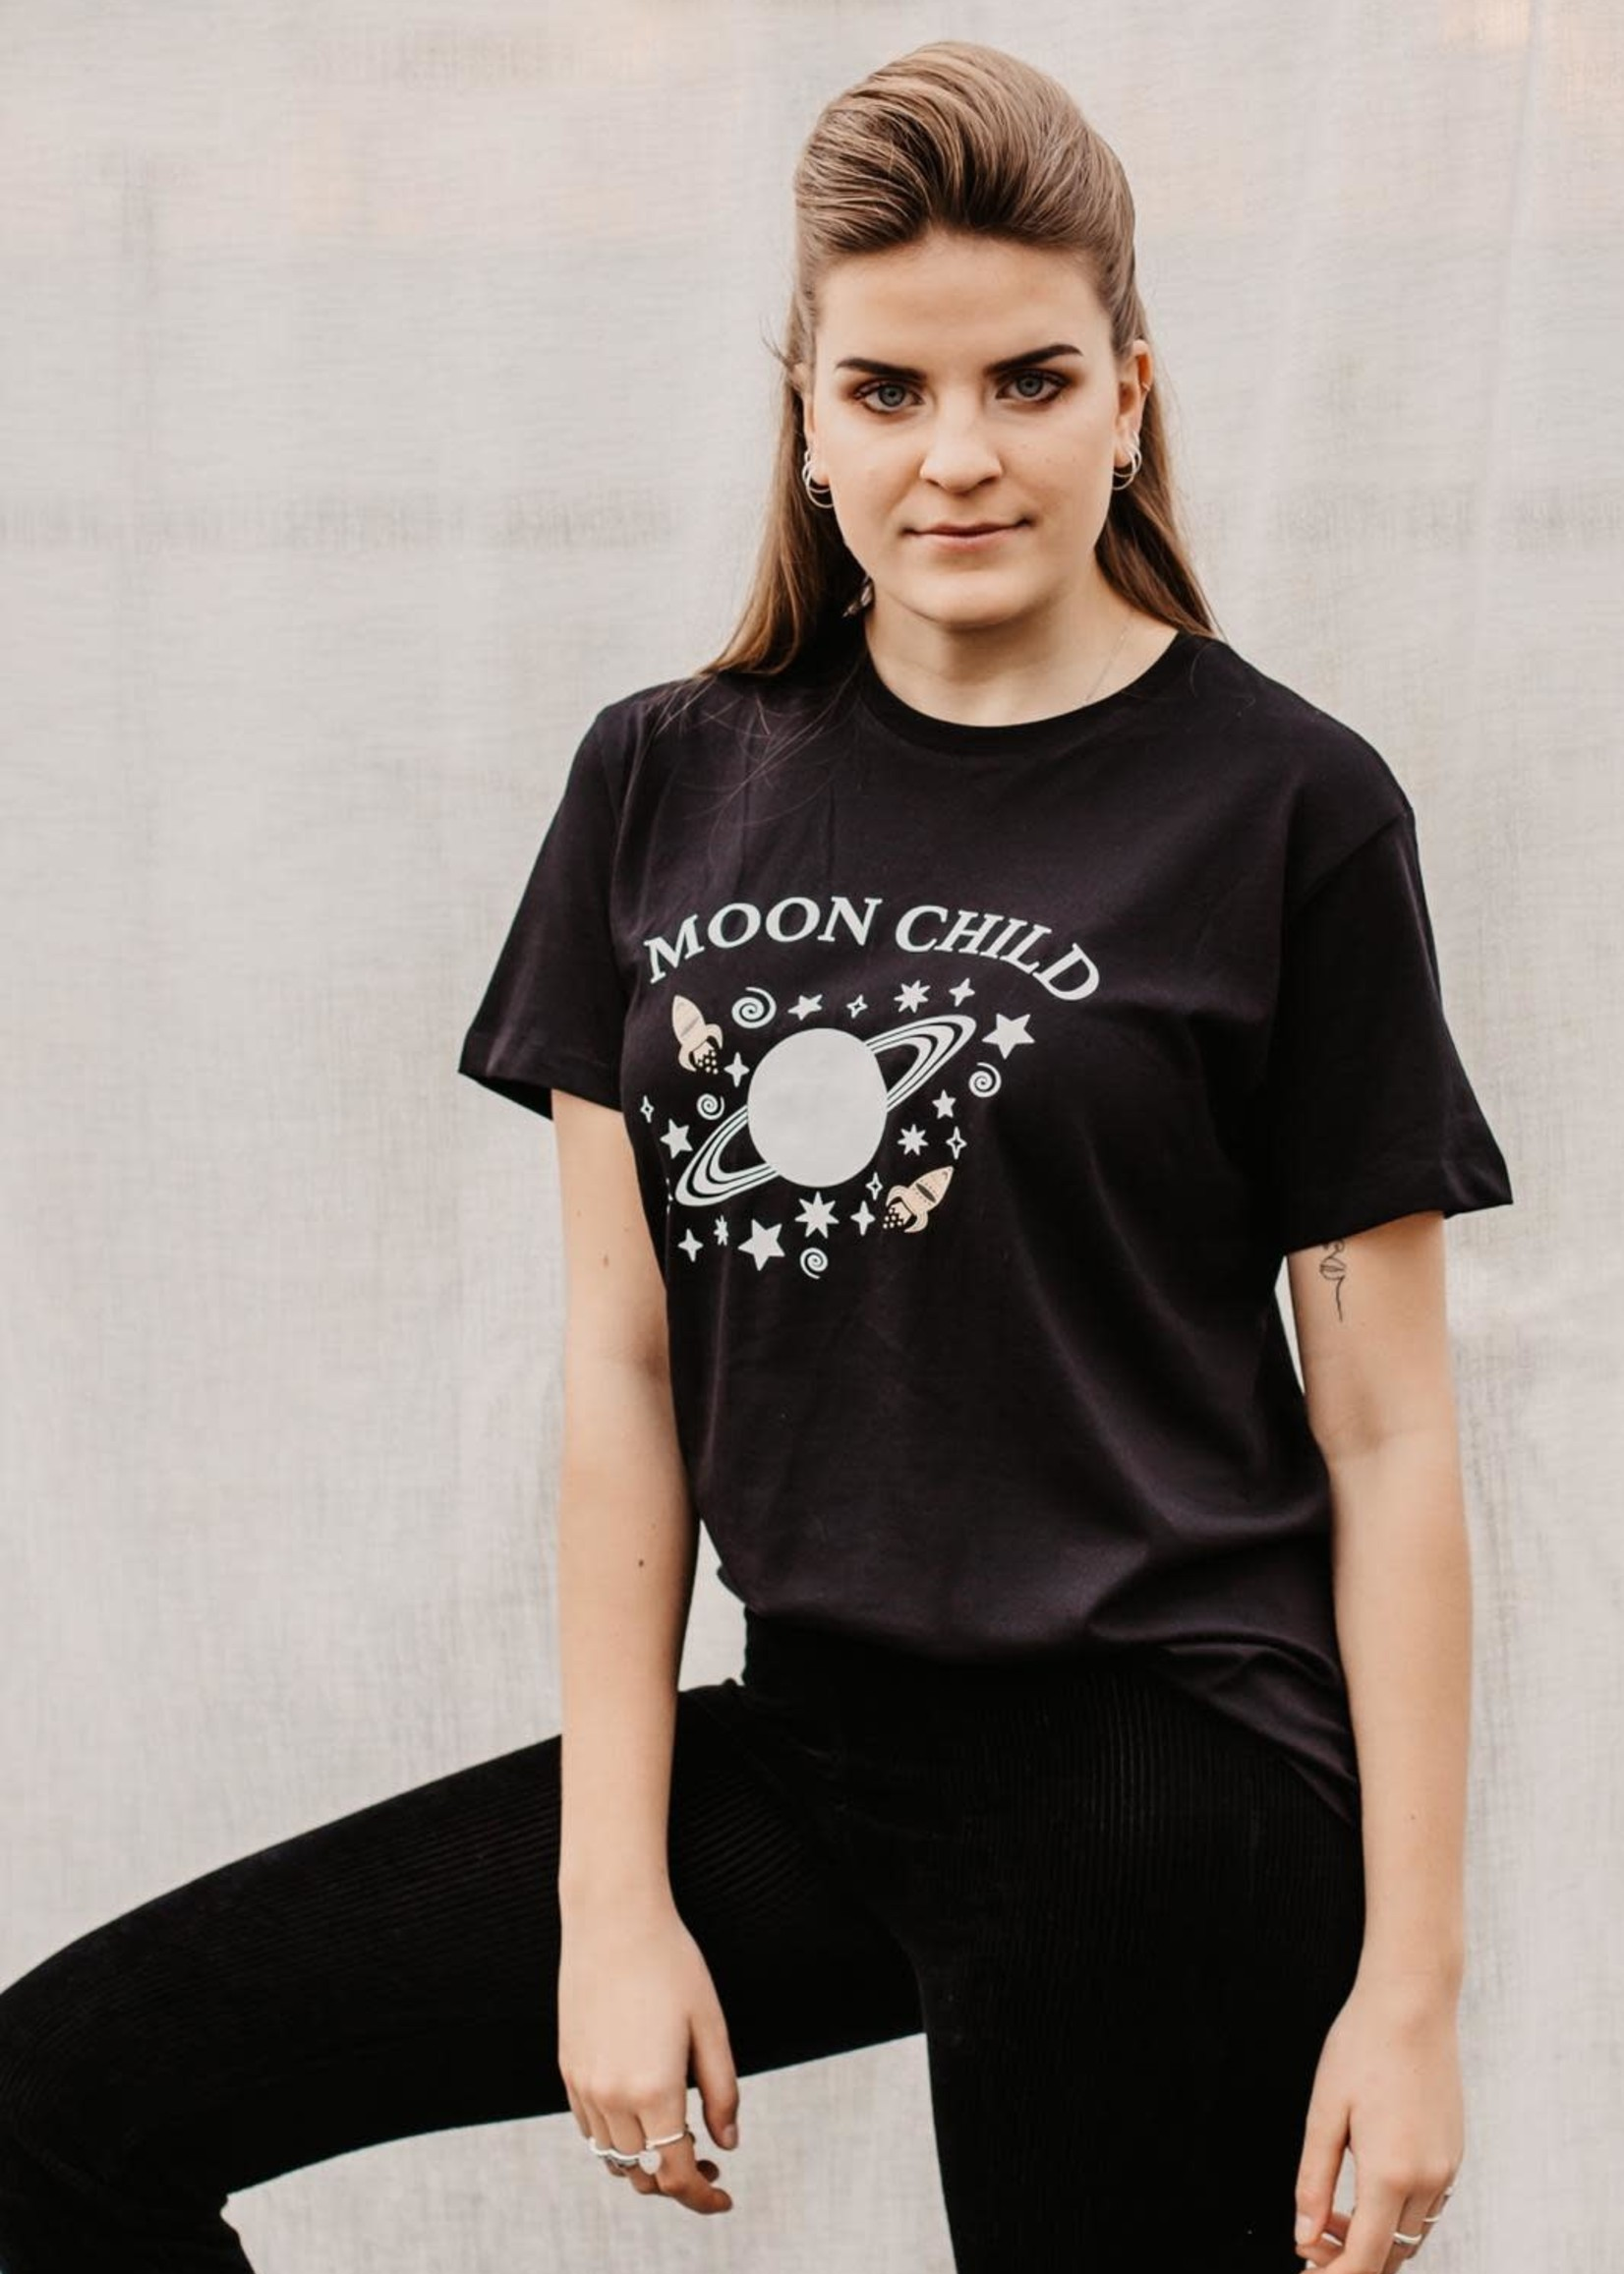 Studio Mays Studio Mays Shirt - Moon Child